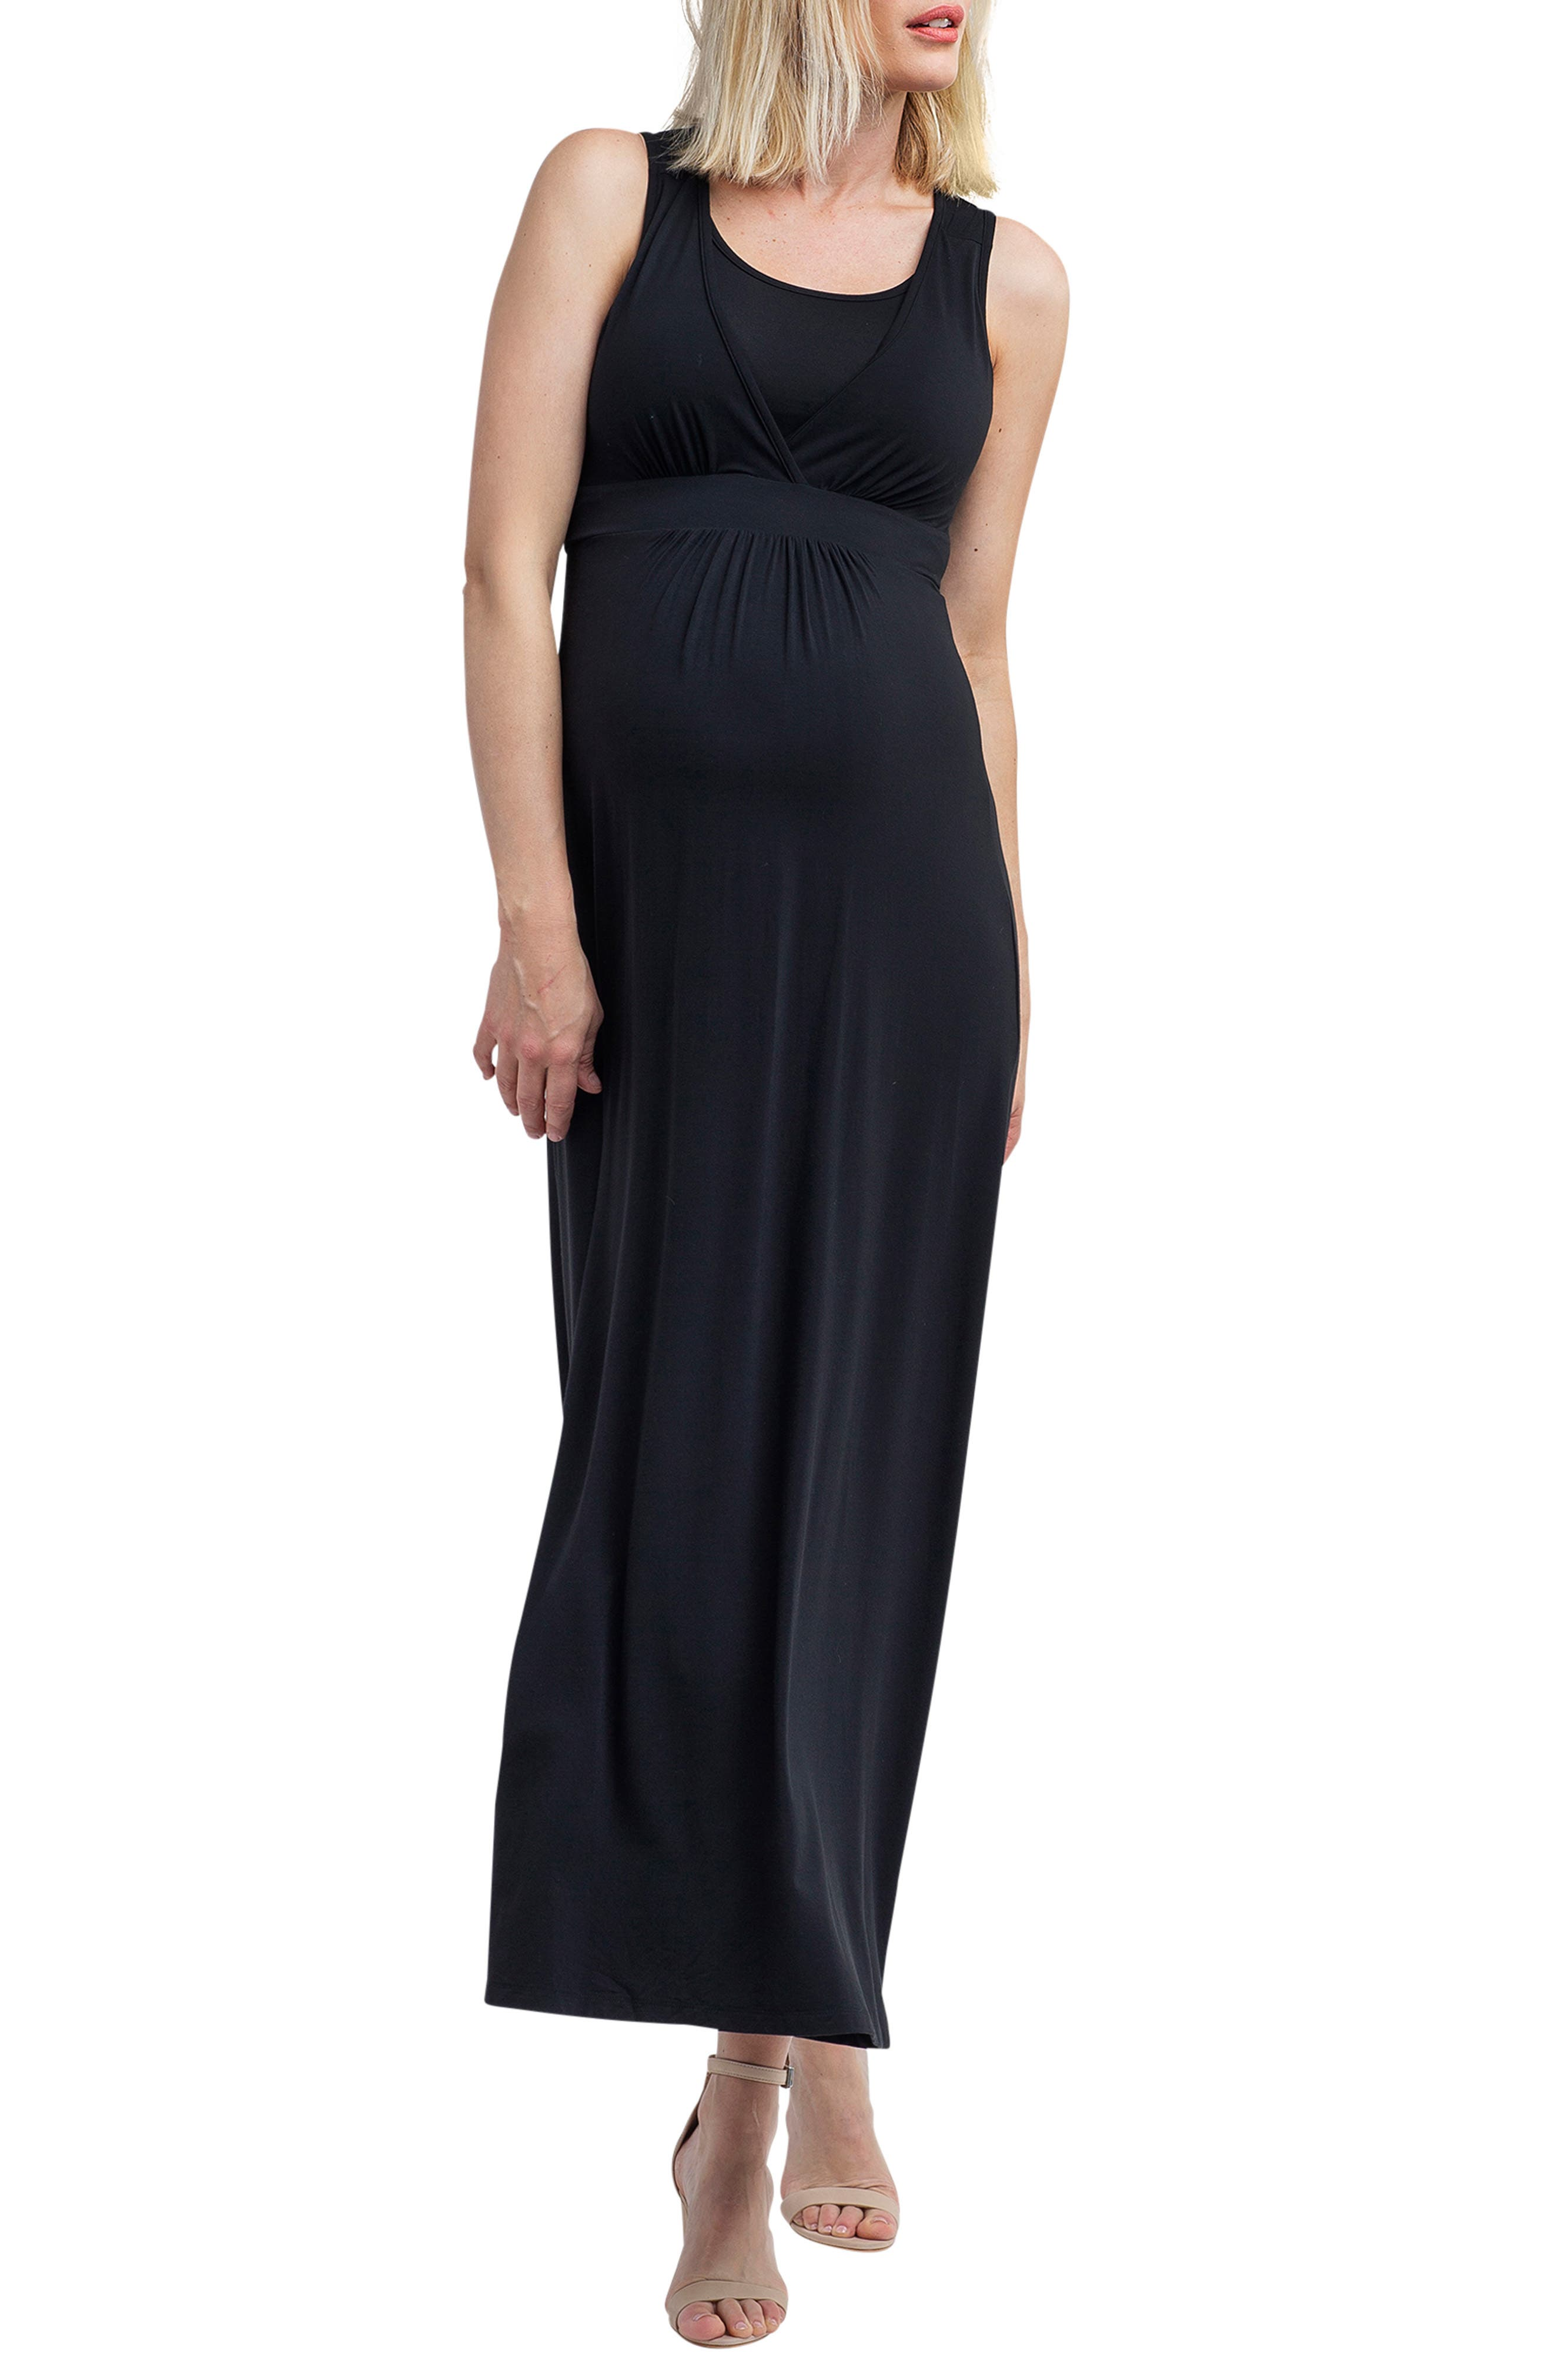 Nom Maternity Hollis Maternity/nursing Maxi Dress, Black